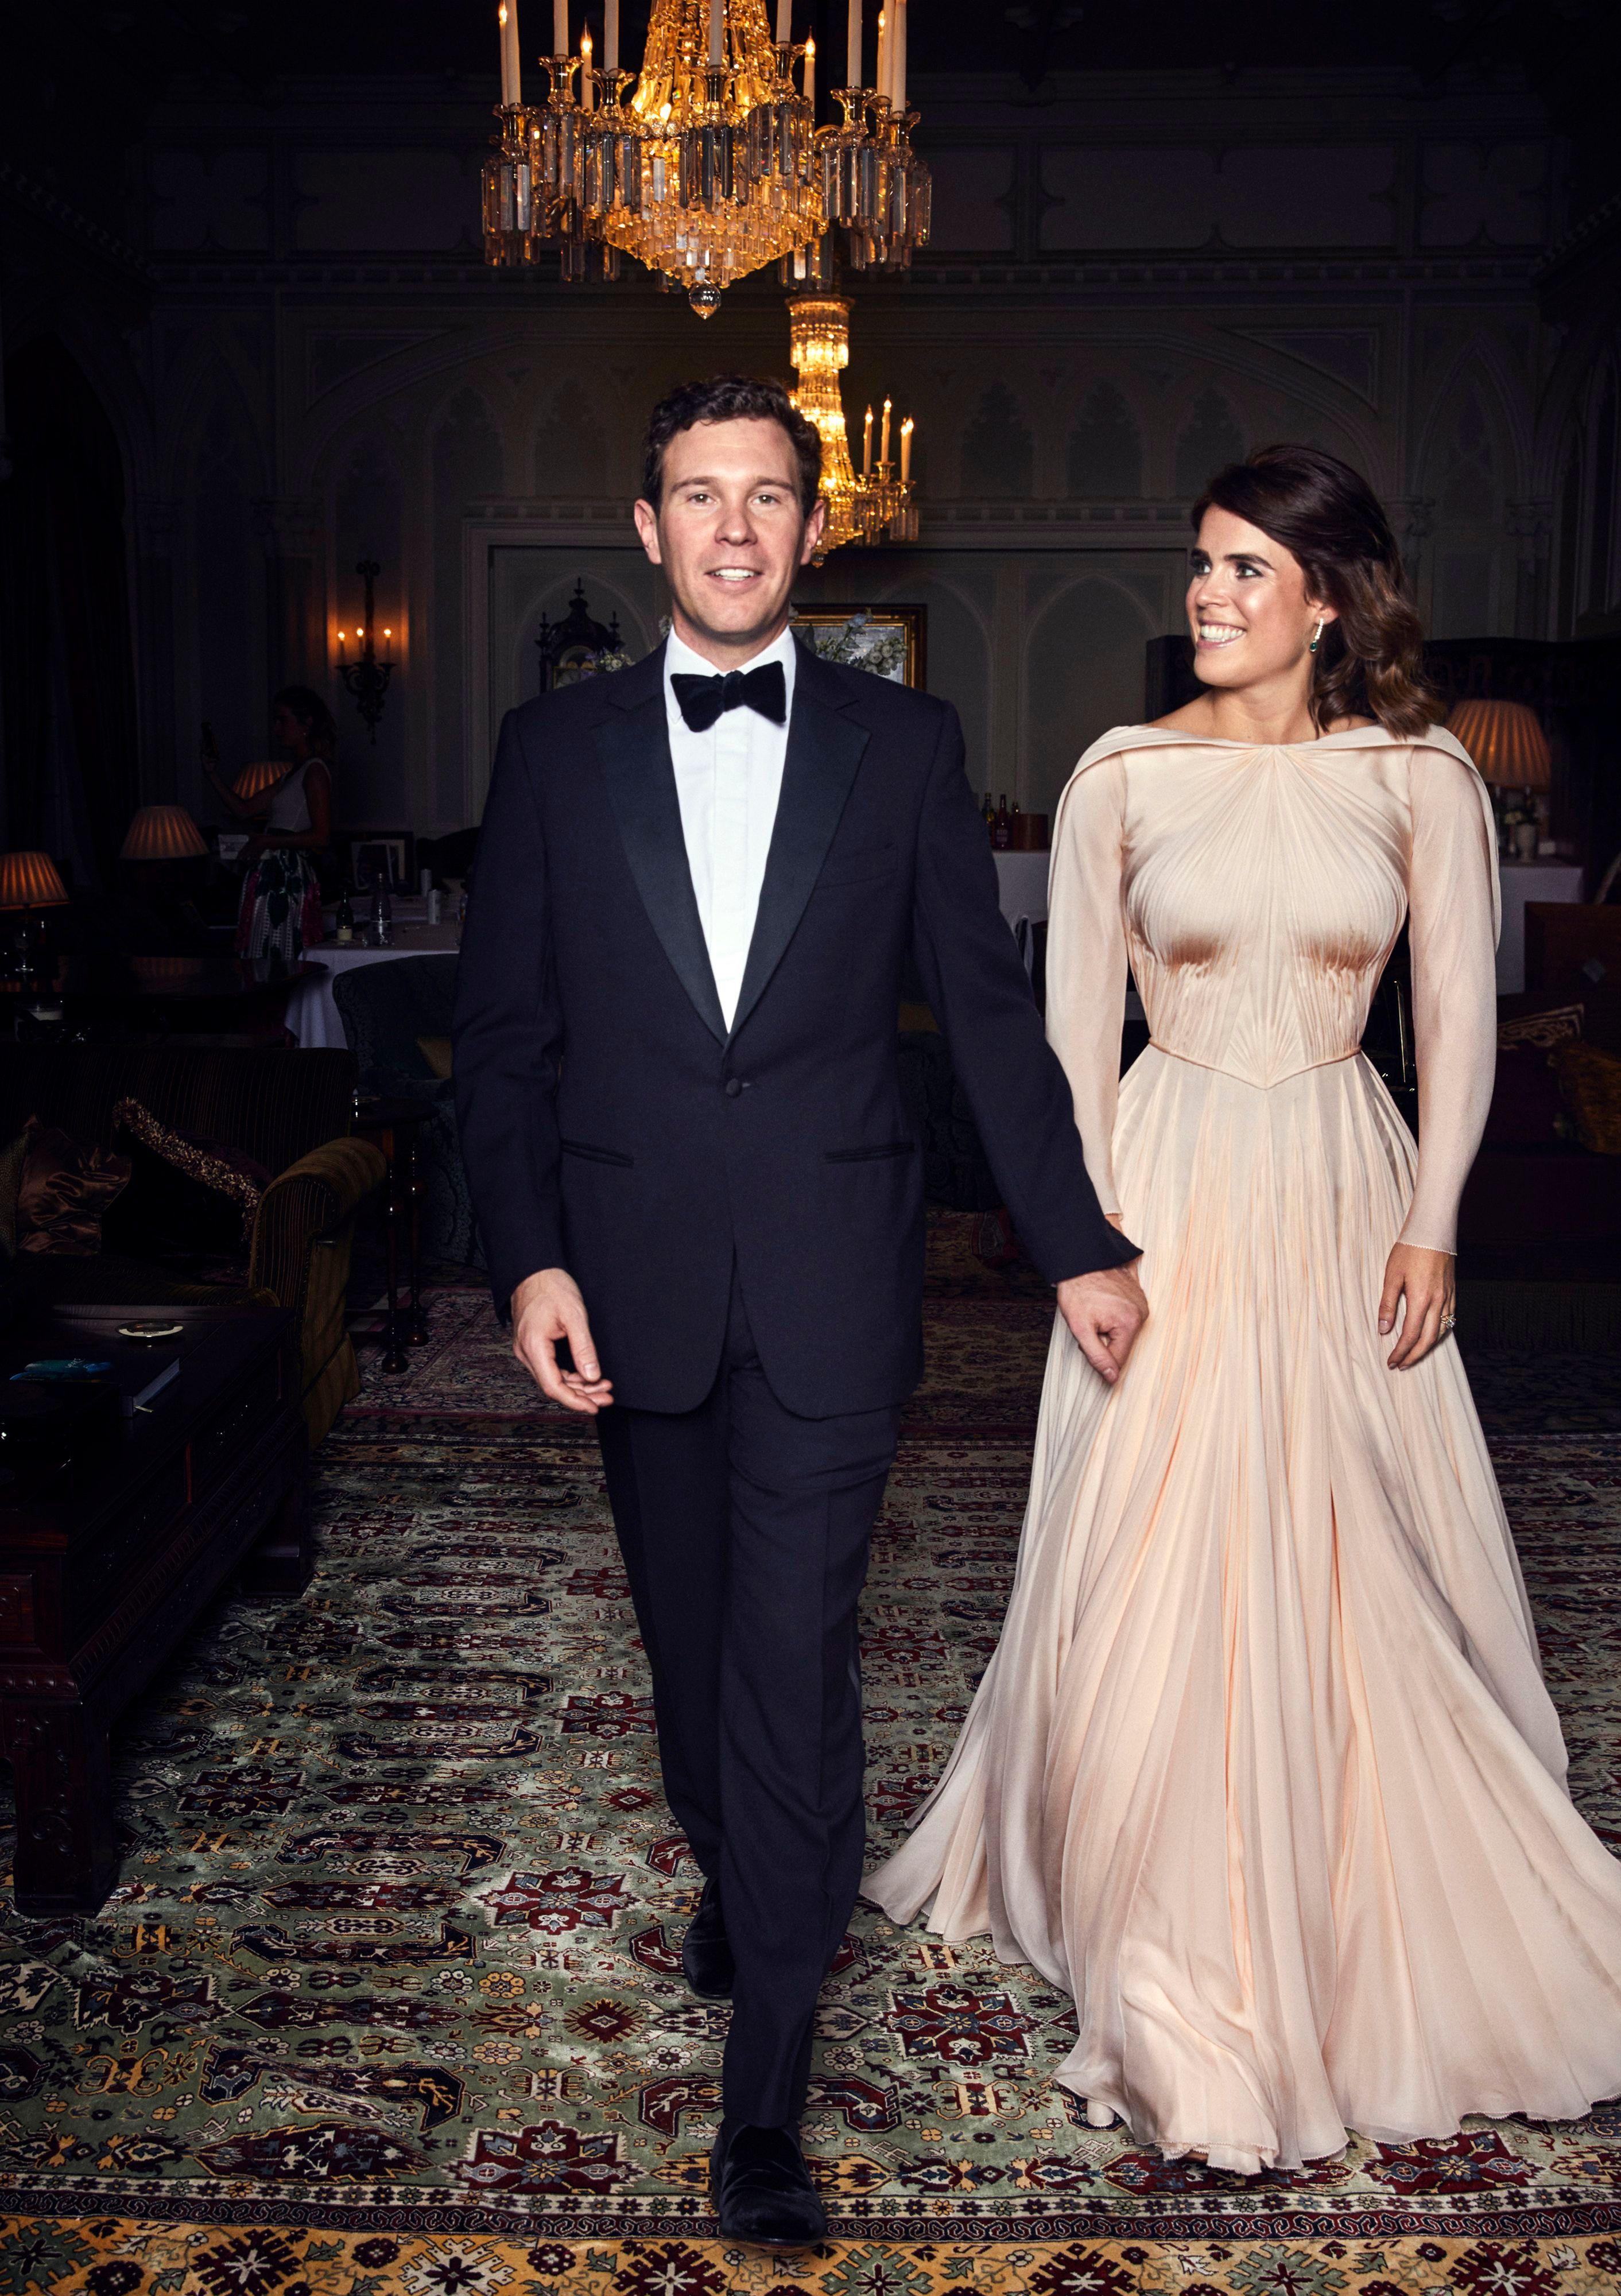 Princess Eugenie's evening dress designed by Zac Posen